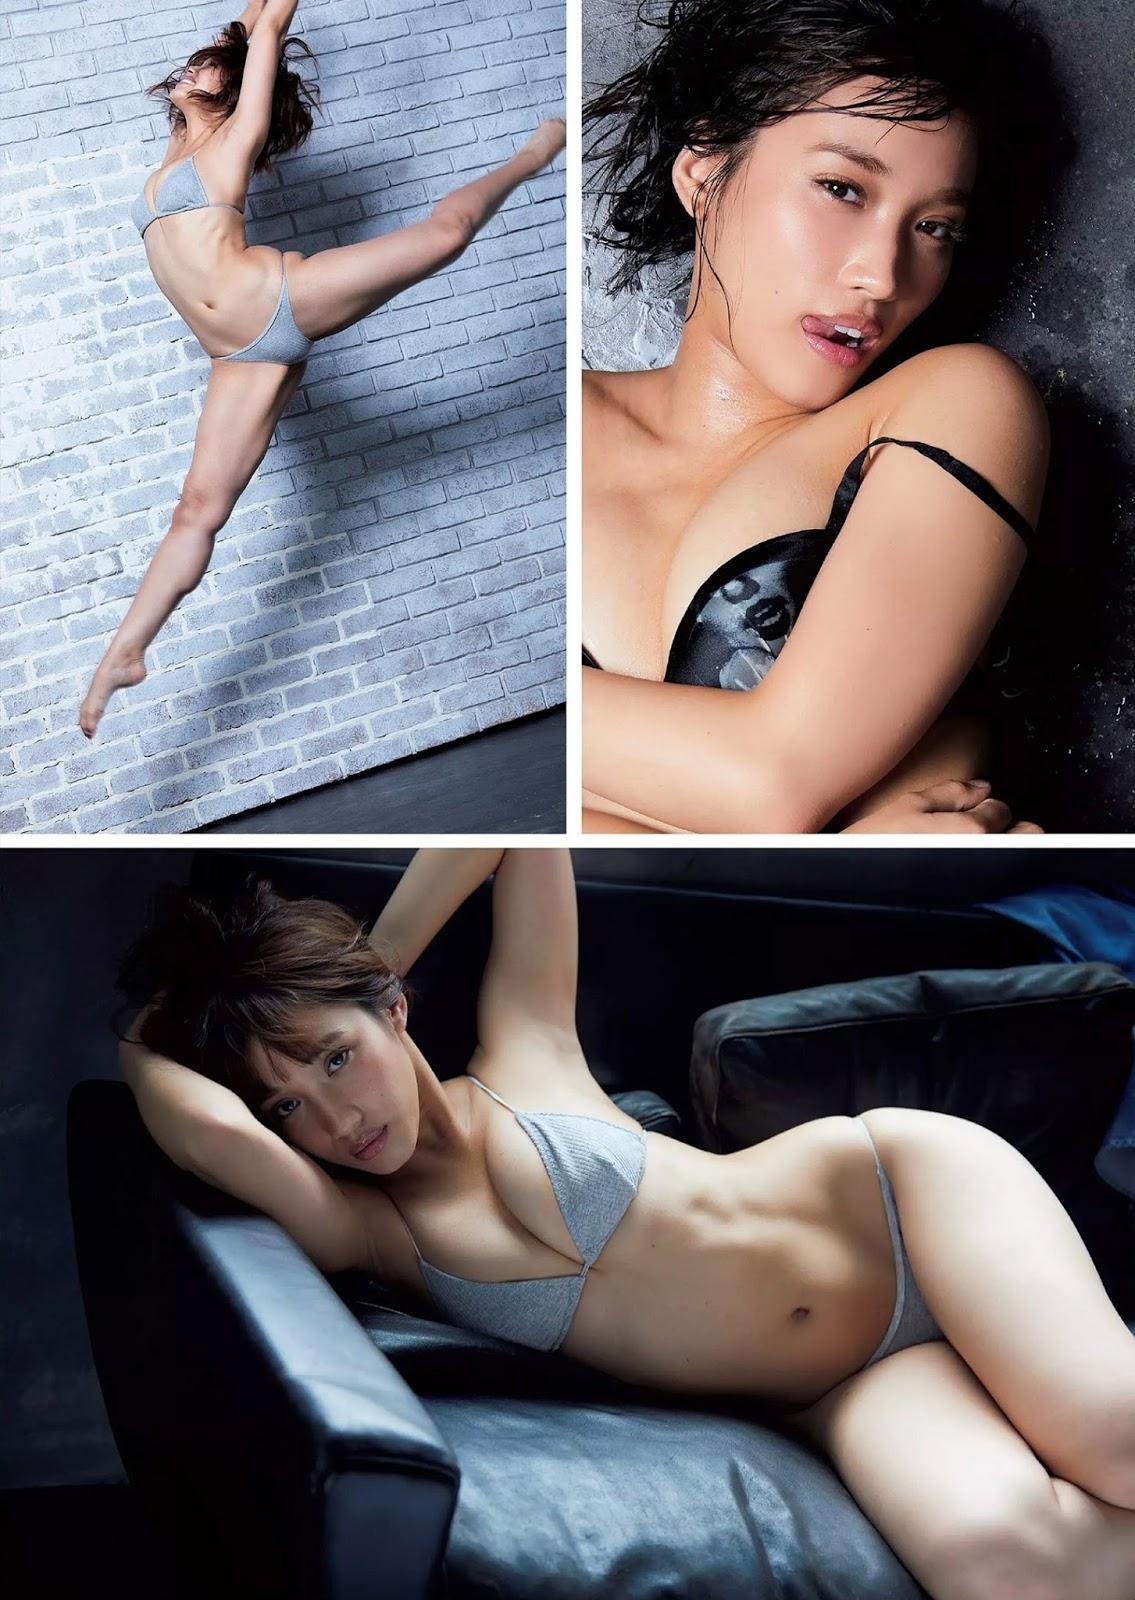 Sario Okada 岡田サリオ, Weekly Playboy 2017 No.50 (週刊プレイボーイ 2017年50号)